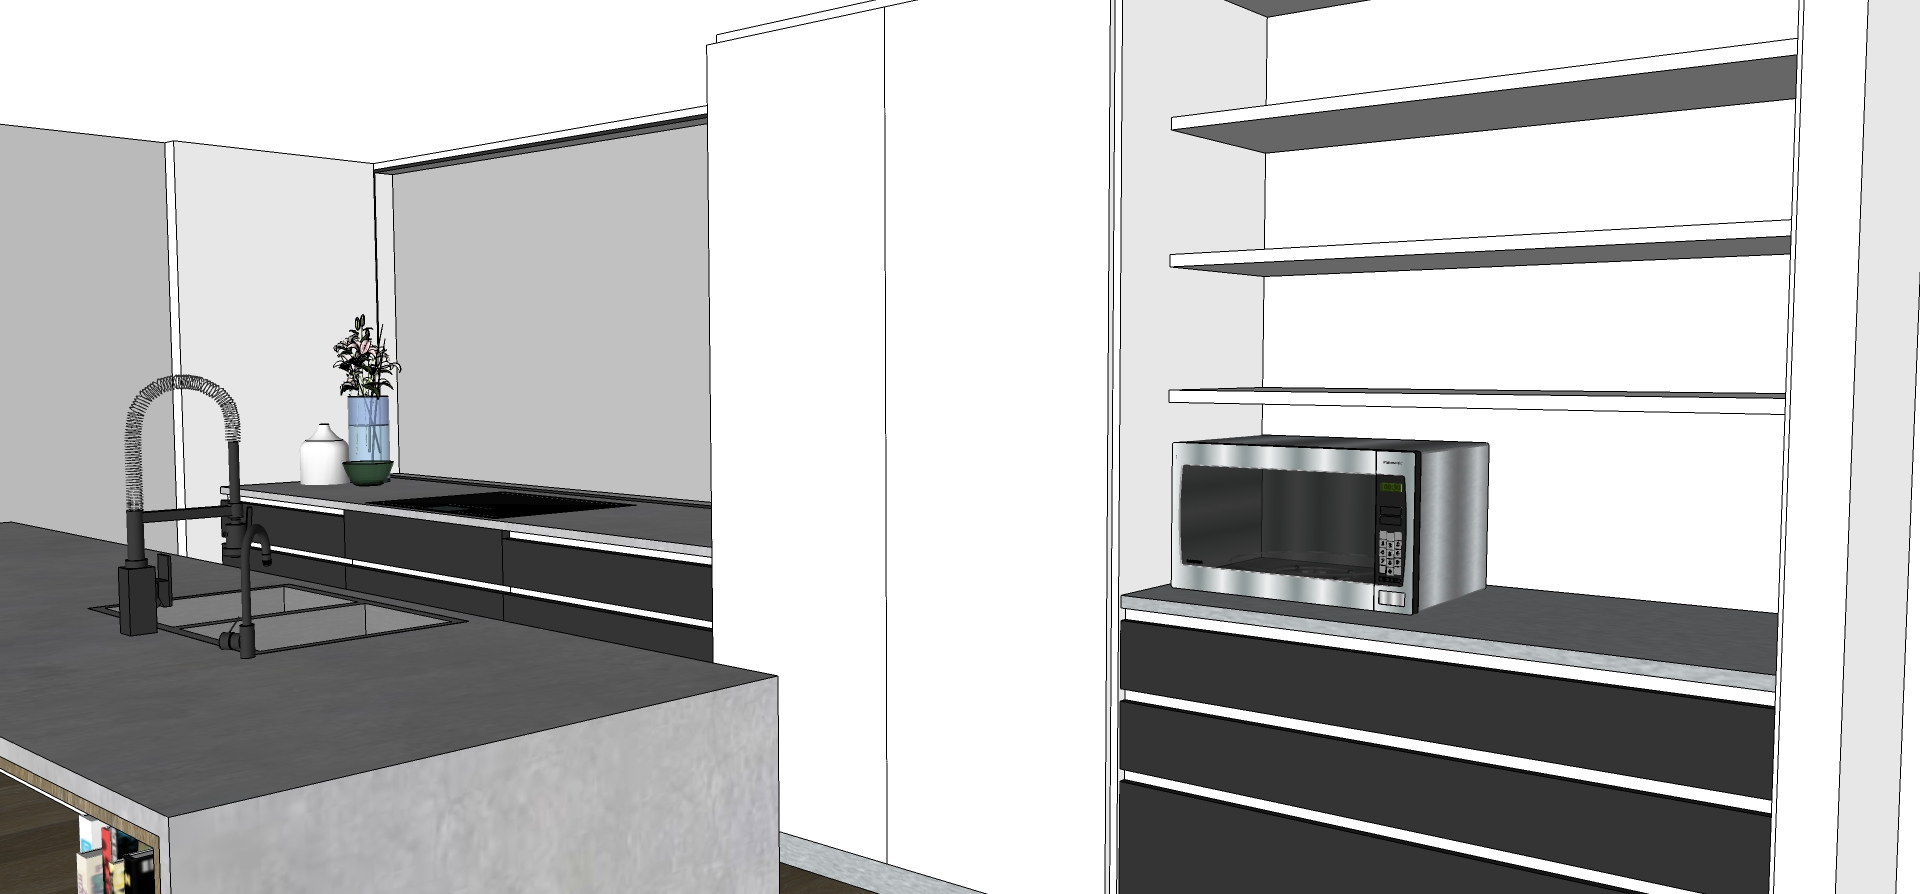 Palm Springs inspired kitchen design